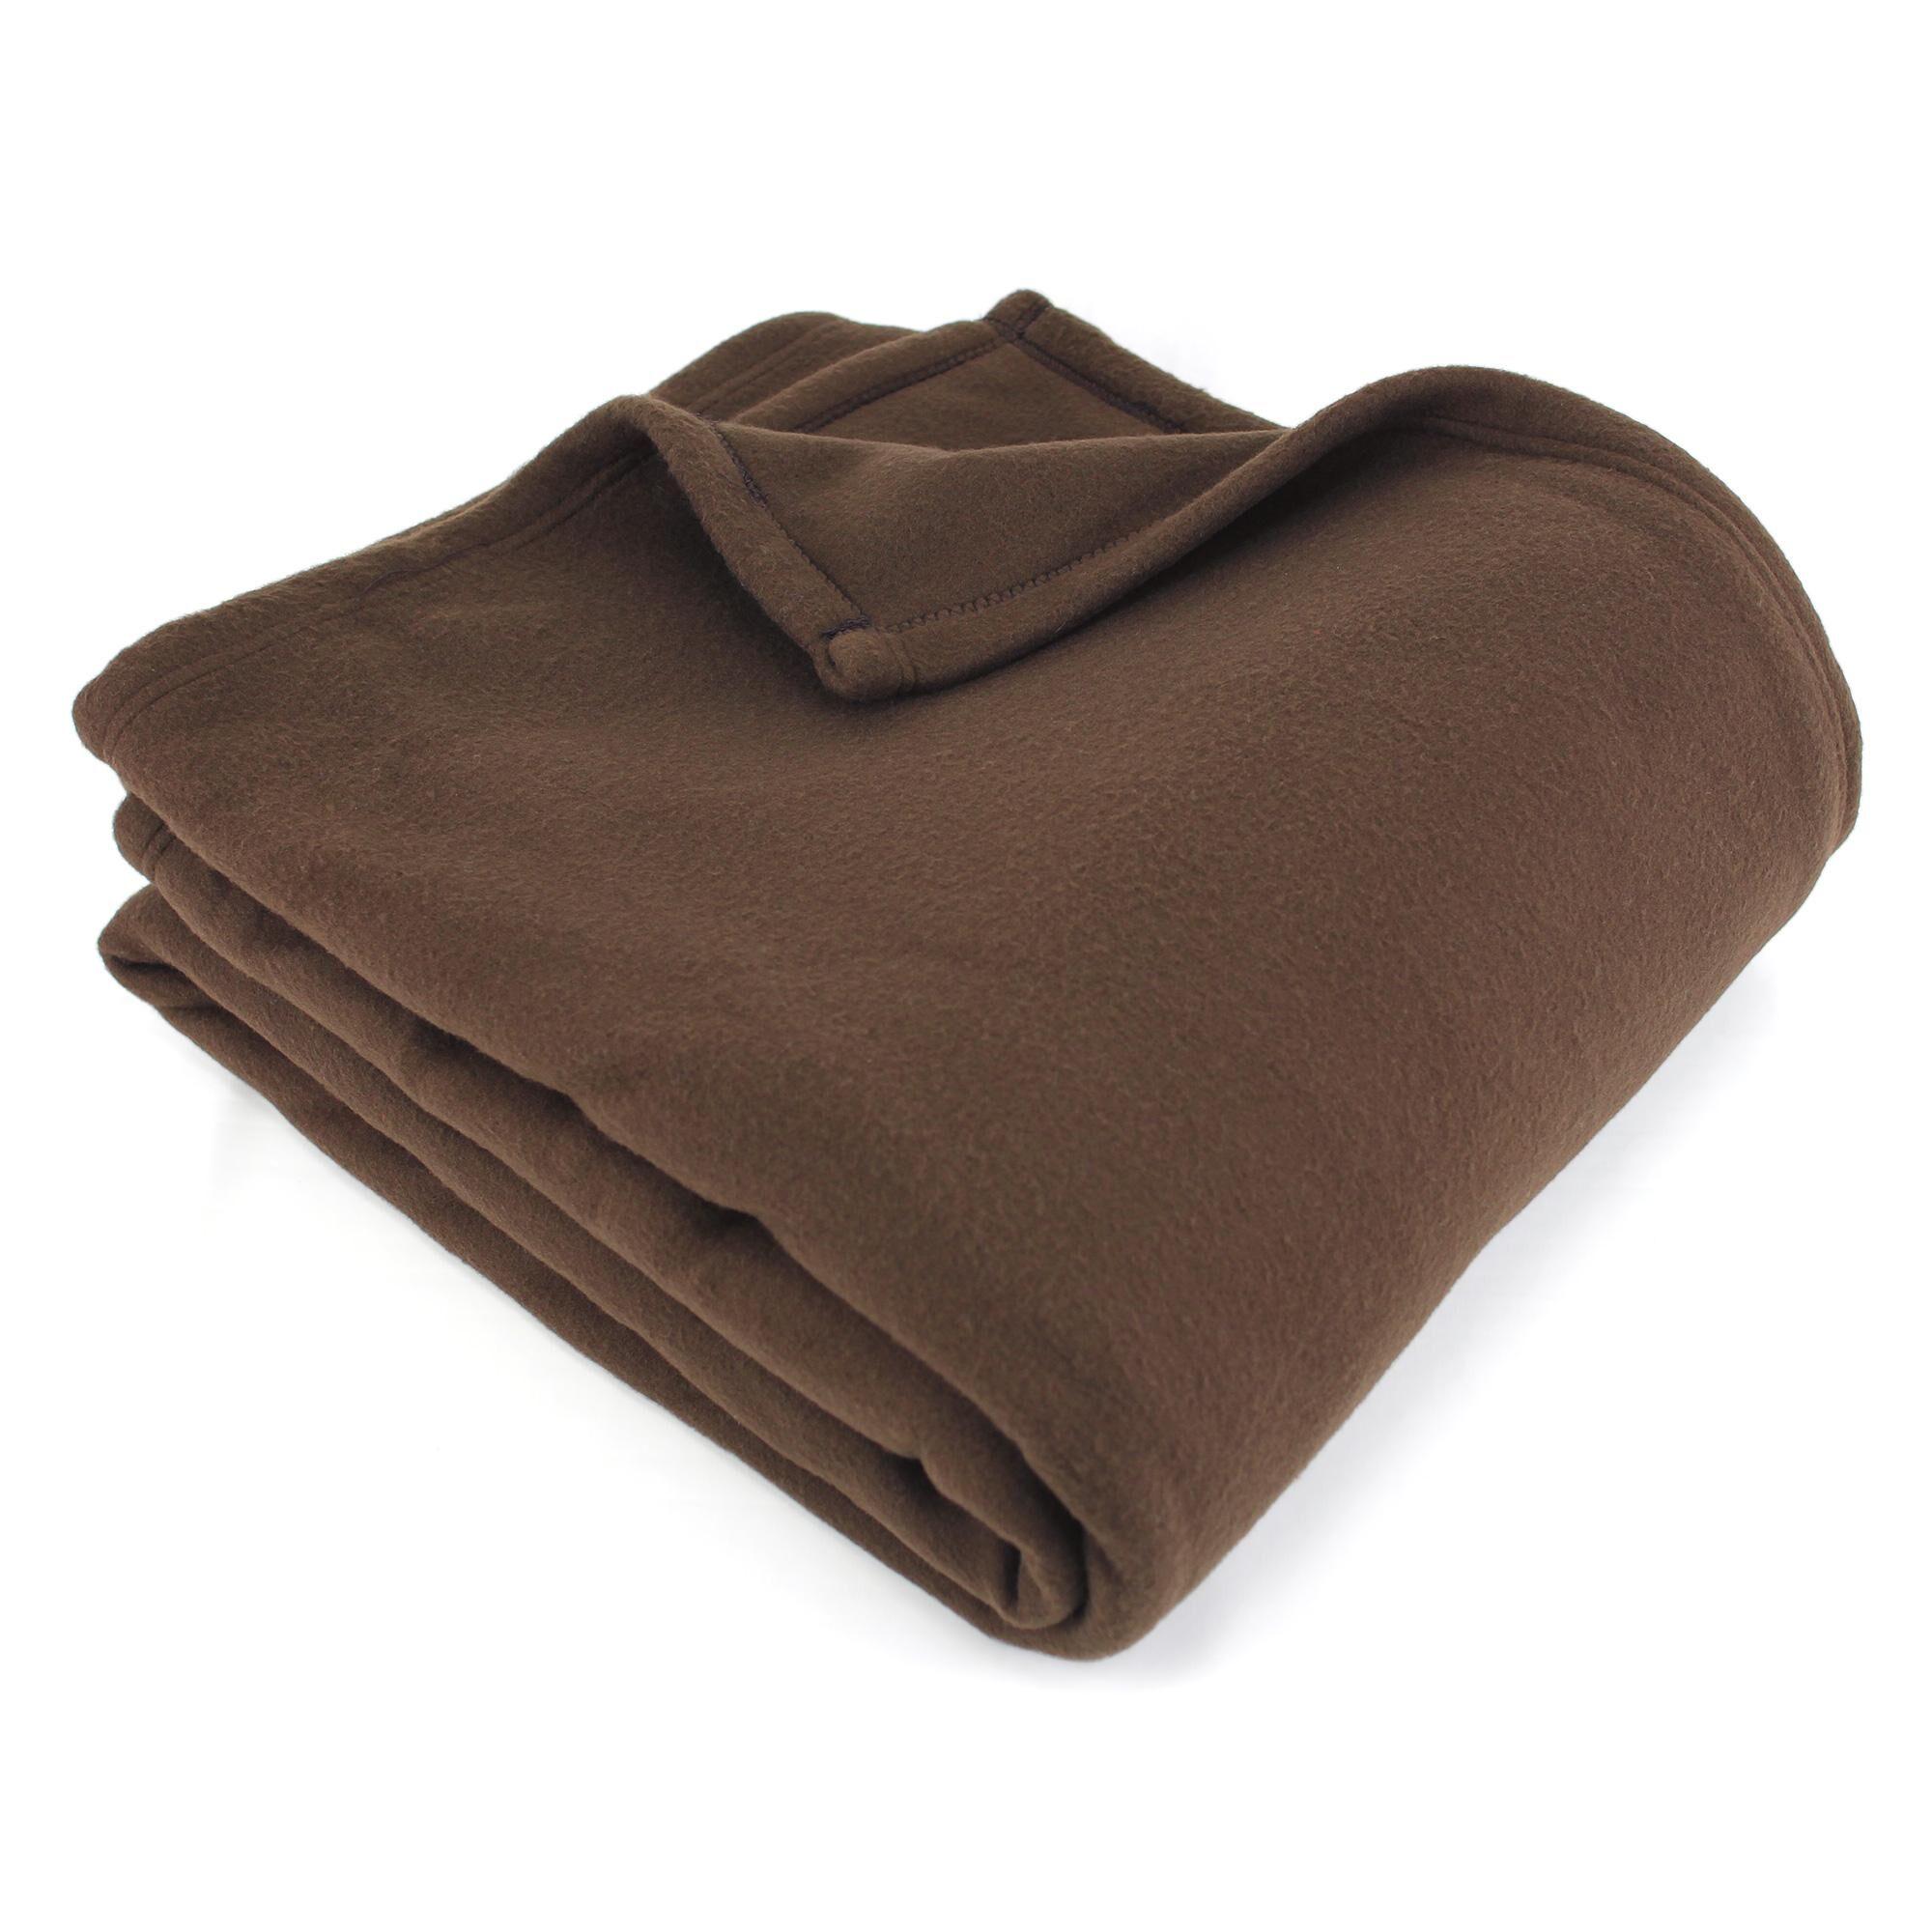 Linnea Couverture polaire 220x240 cm 100% Polyester 350 g/m2 TEDDY Marron Chocolat